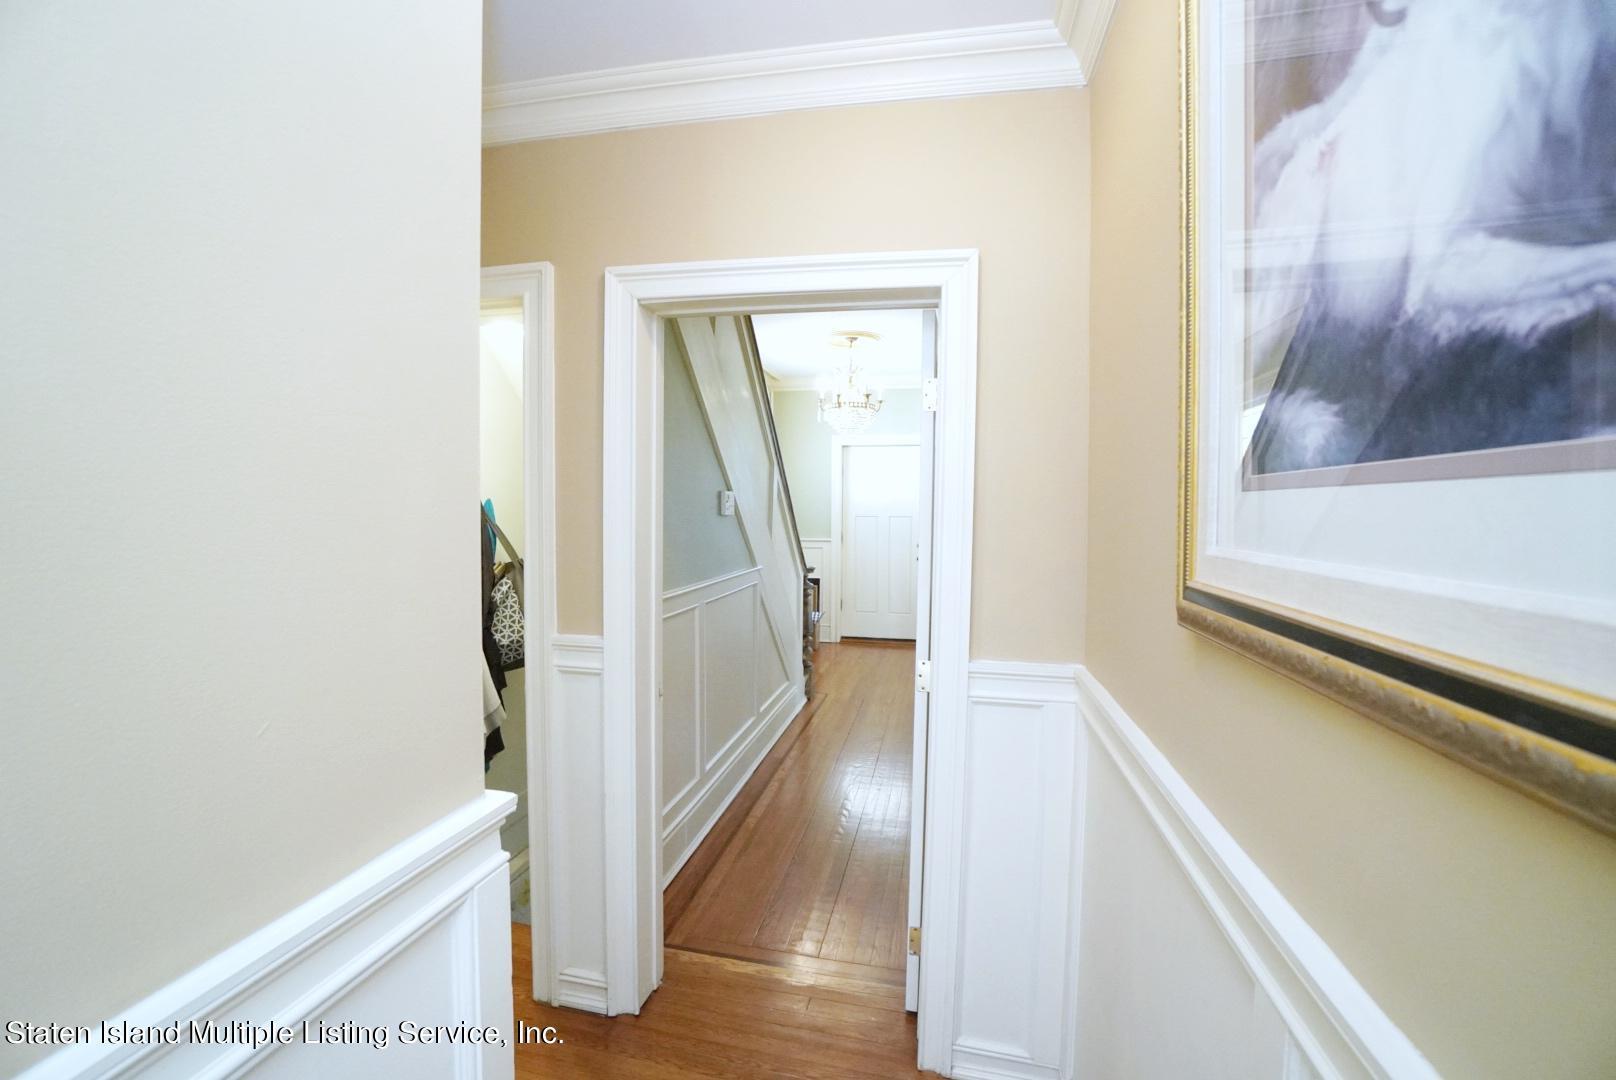 Single Family - Detached 264 Fisher Avenue  Staten Island, NY 10307, MLS-1146898-26